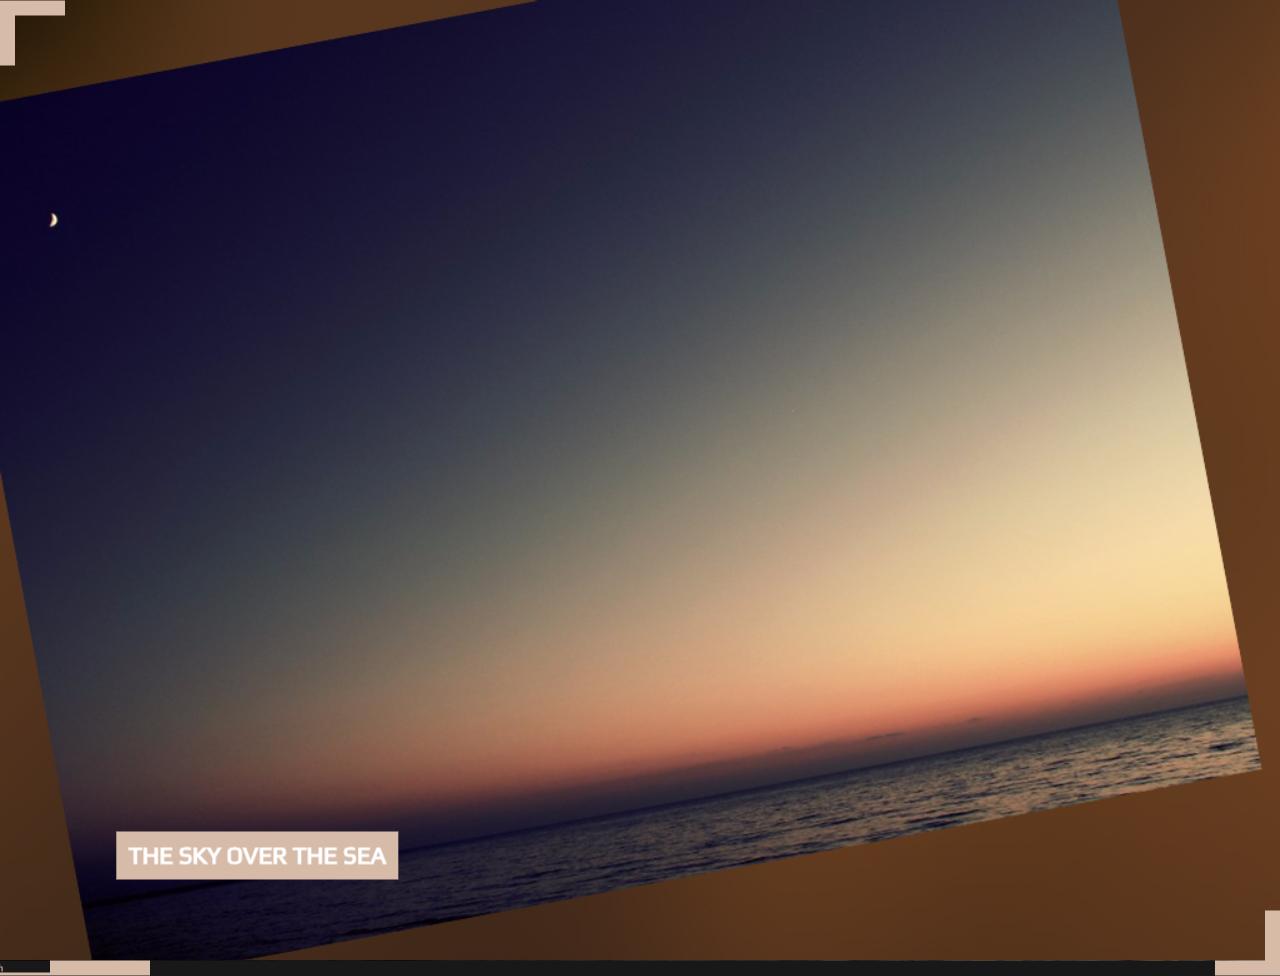 Free Image Slideshow